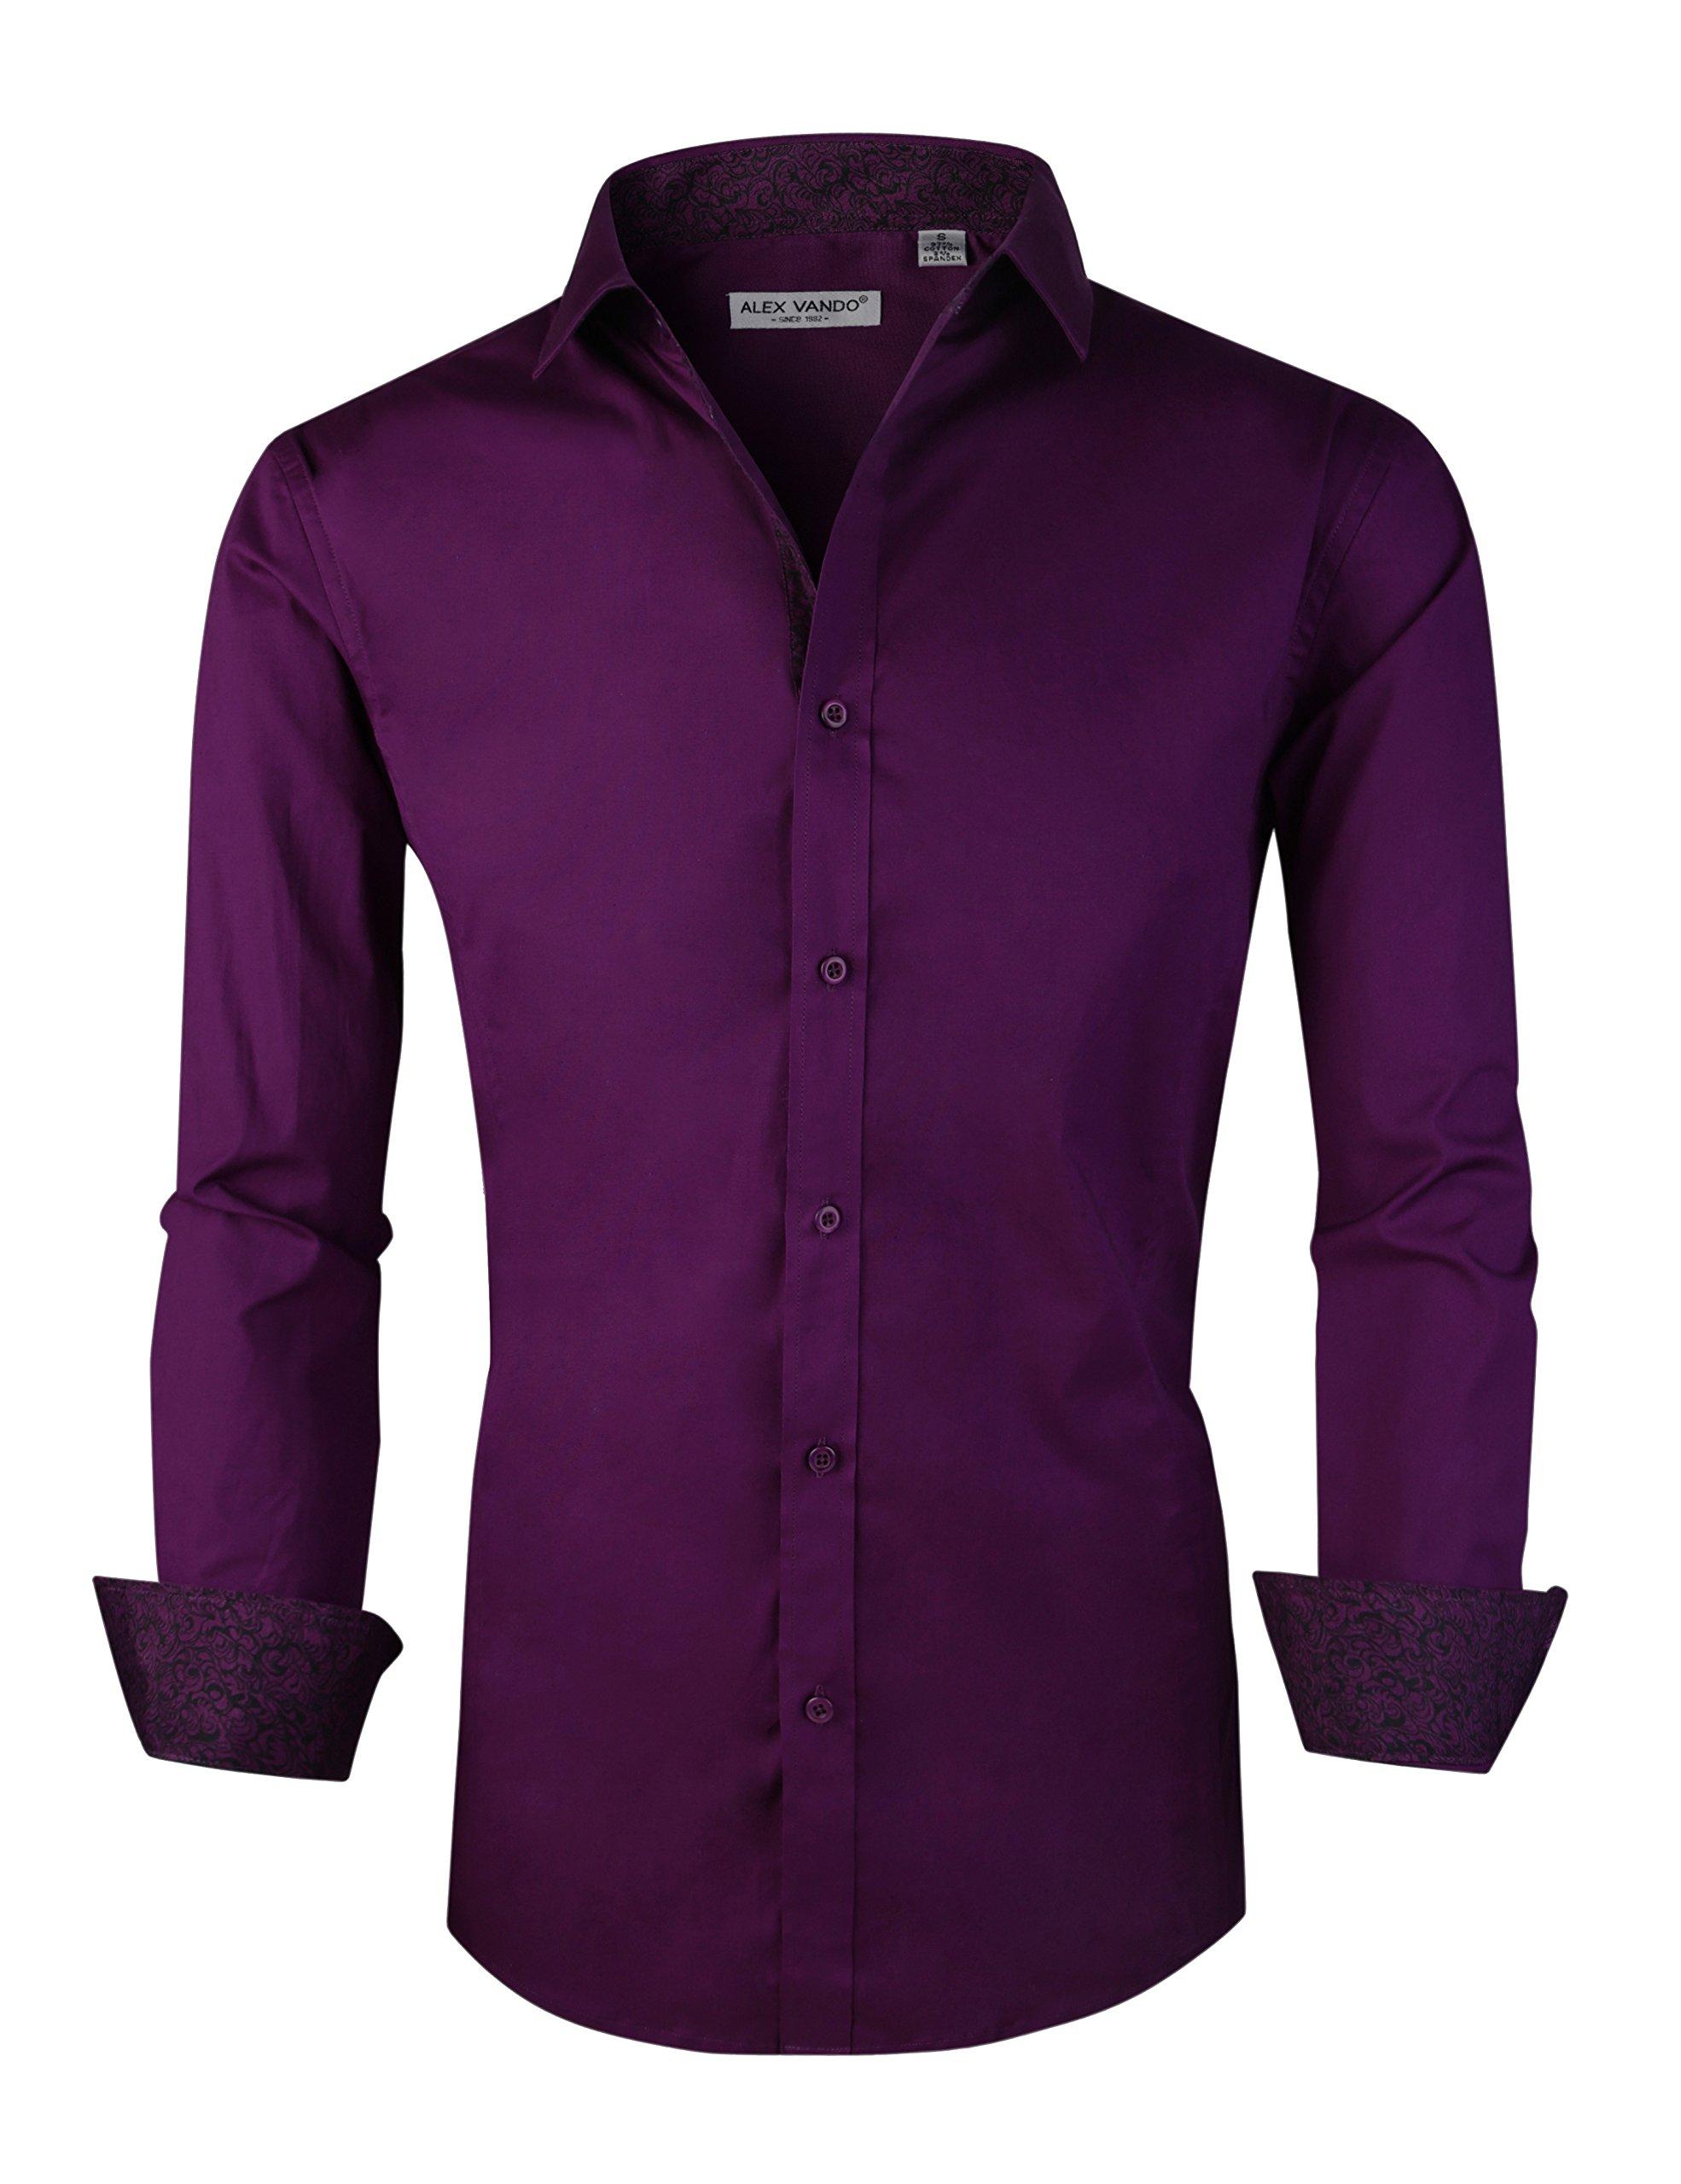 Joey CV Mens Casual Button Down Shirts Long Sleeve Regular Fit(Purple,Large)